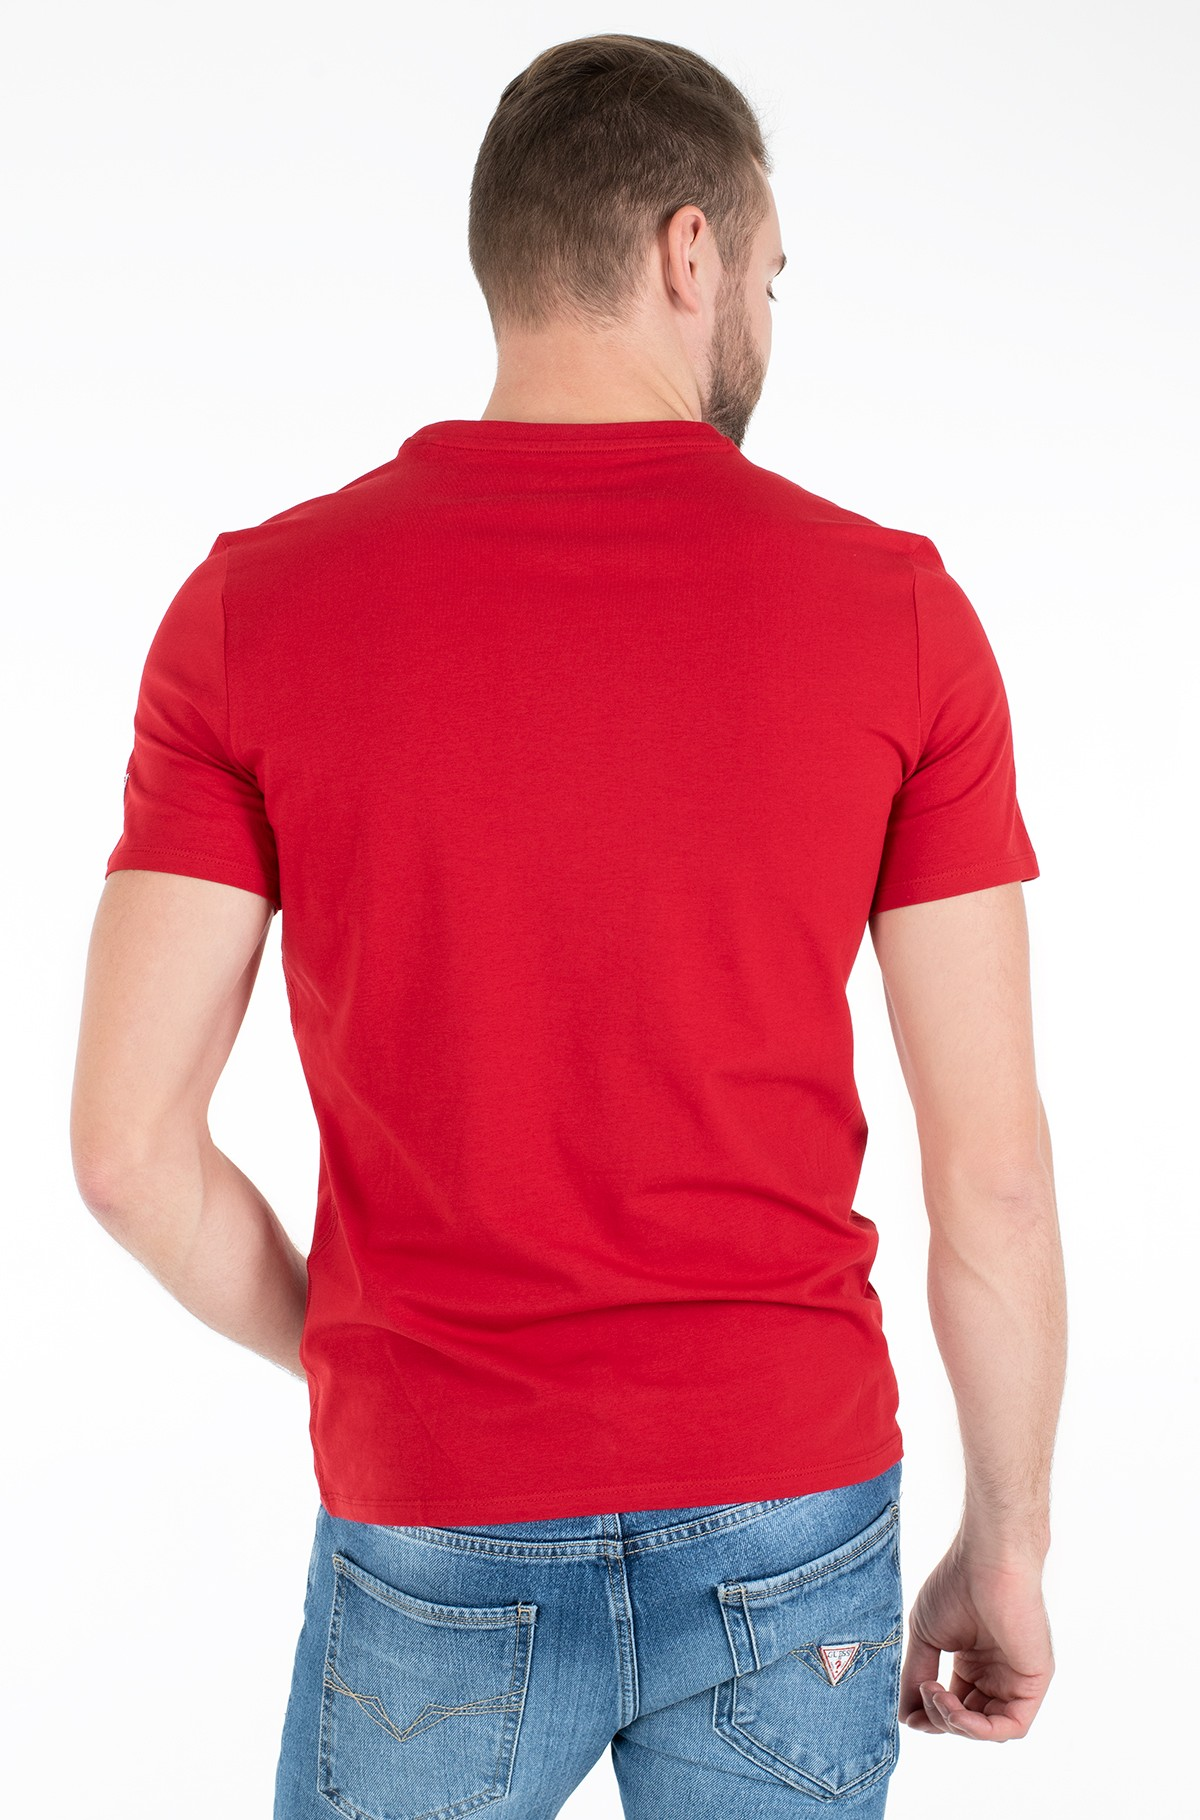 T-shirt M0BI59 J1300-full-2